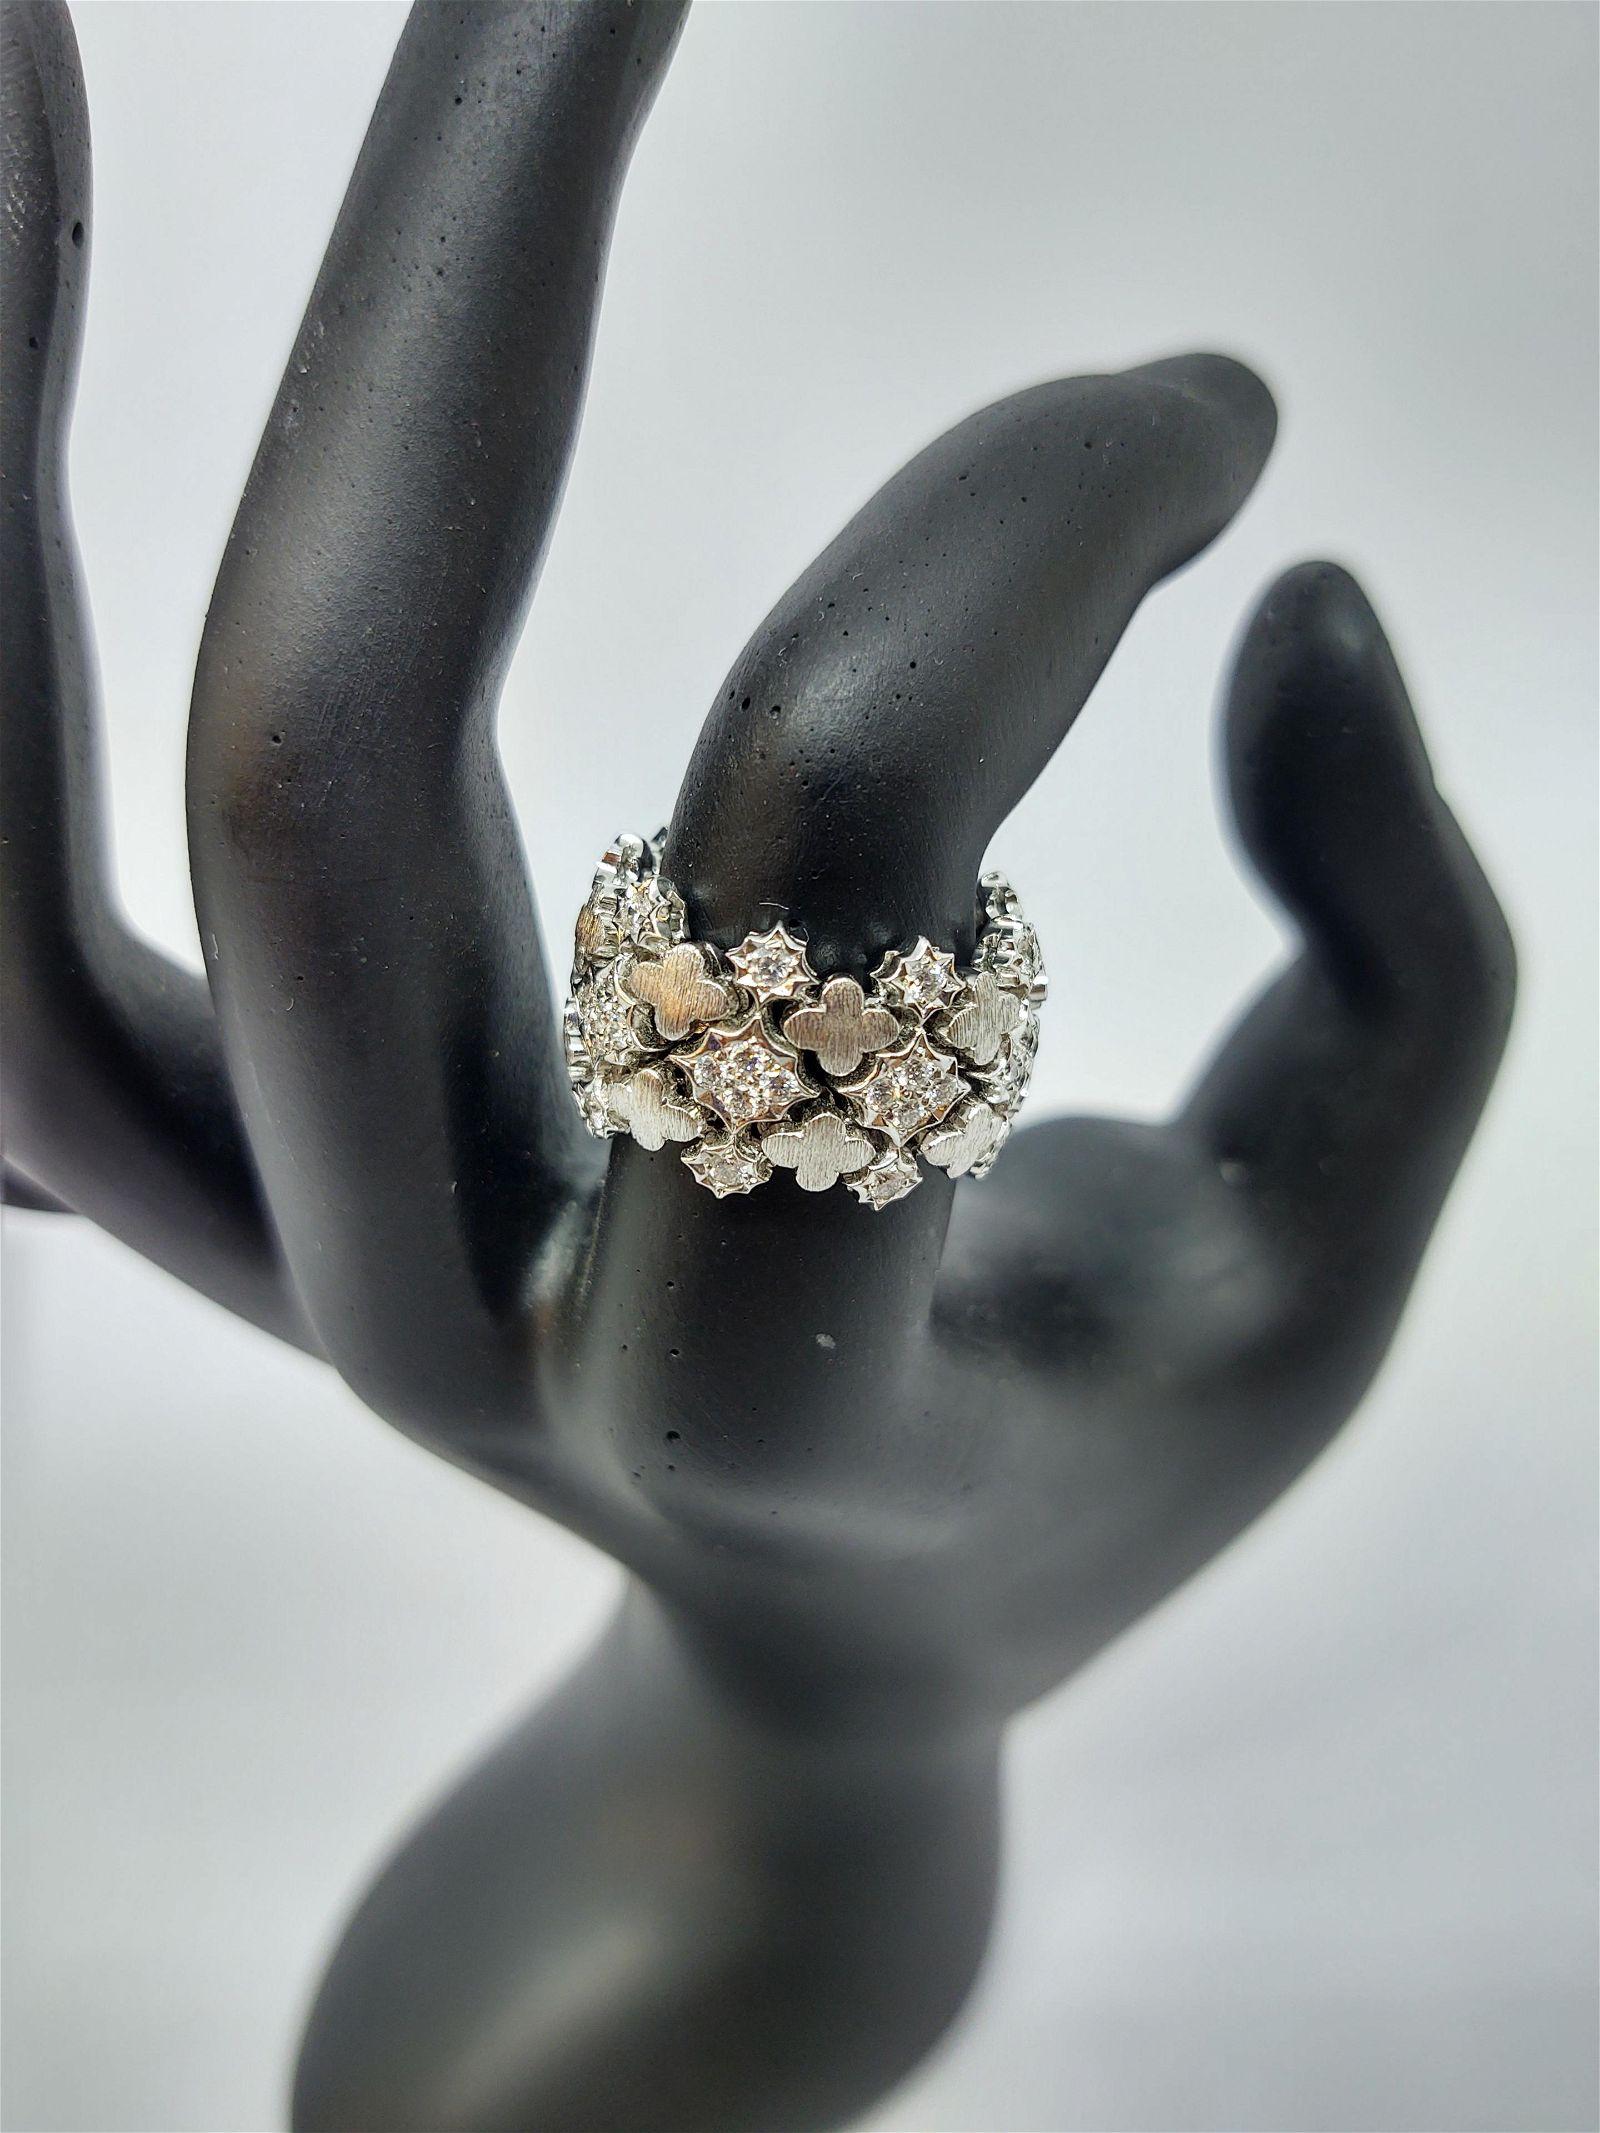 18 k White Gold Eternity Band Ring